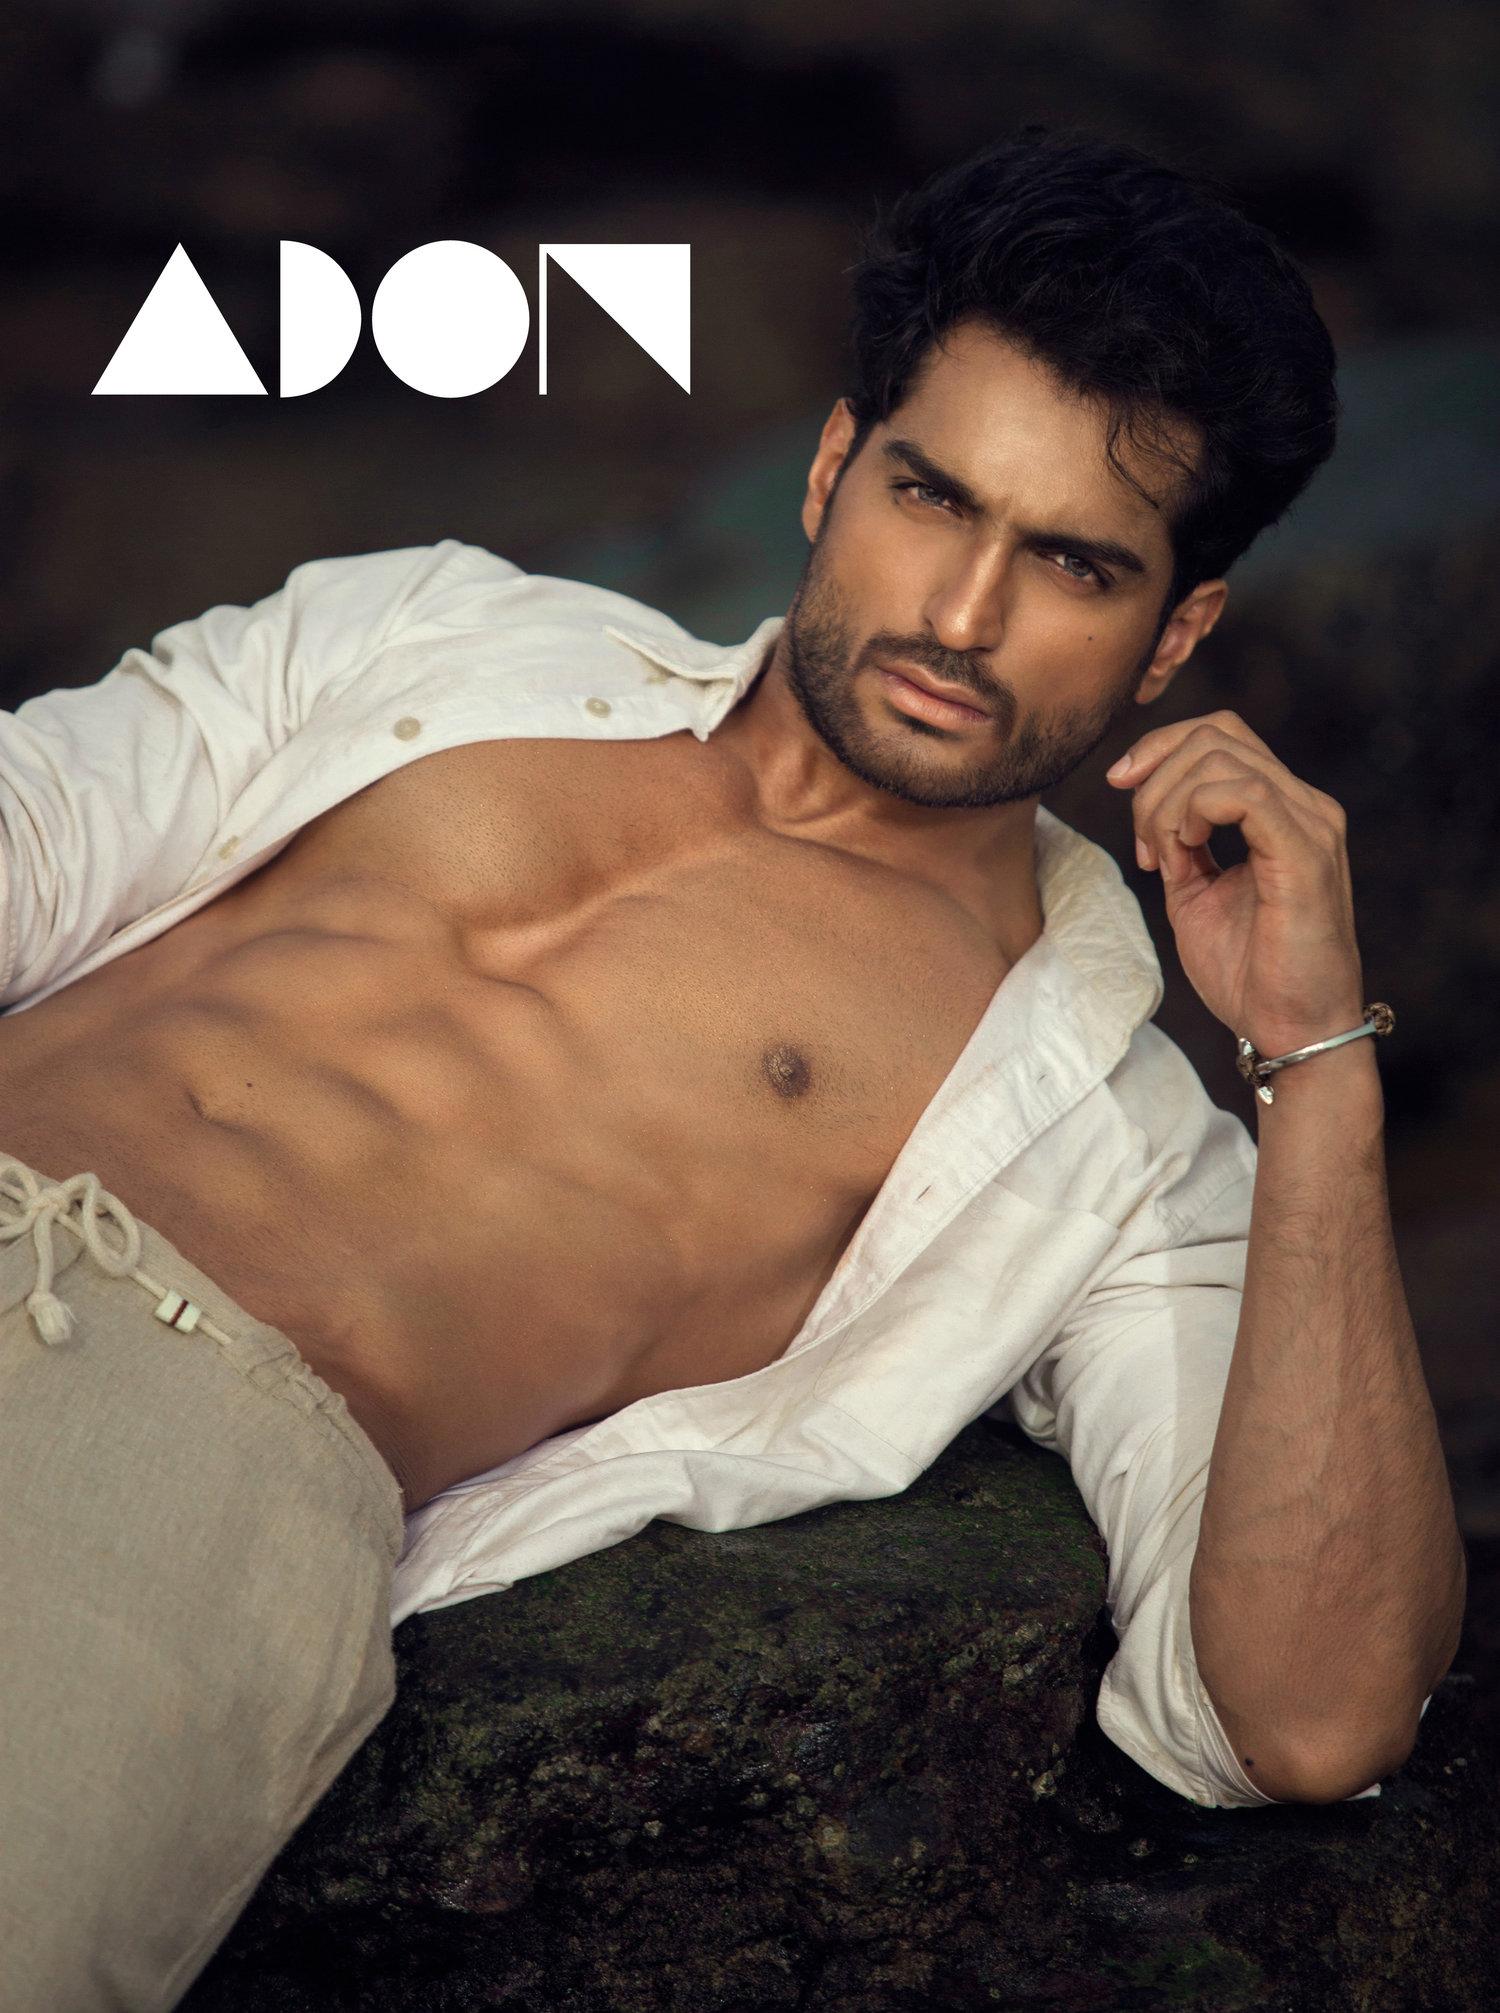 Adon Exclusive: Model Omer Shehzad By Khawer Jadoon